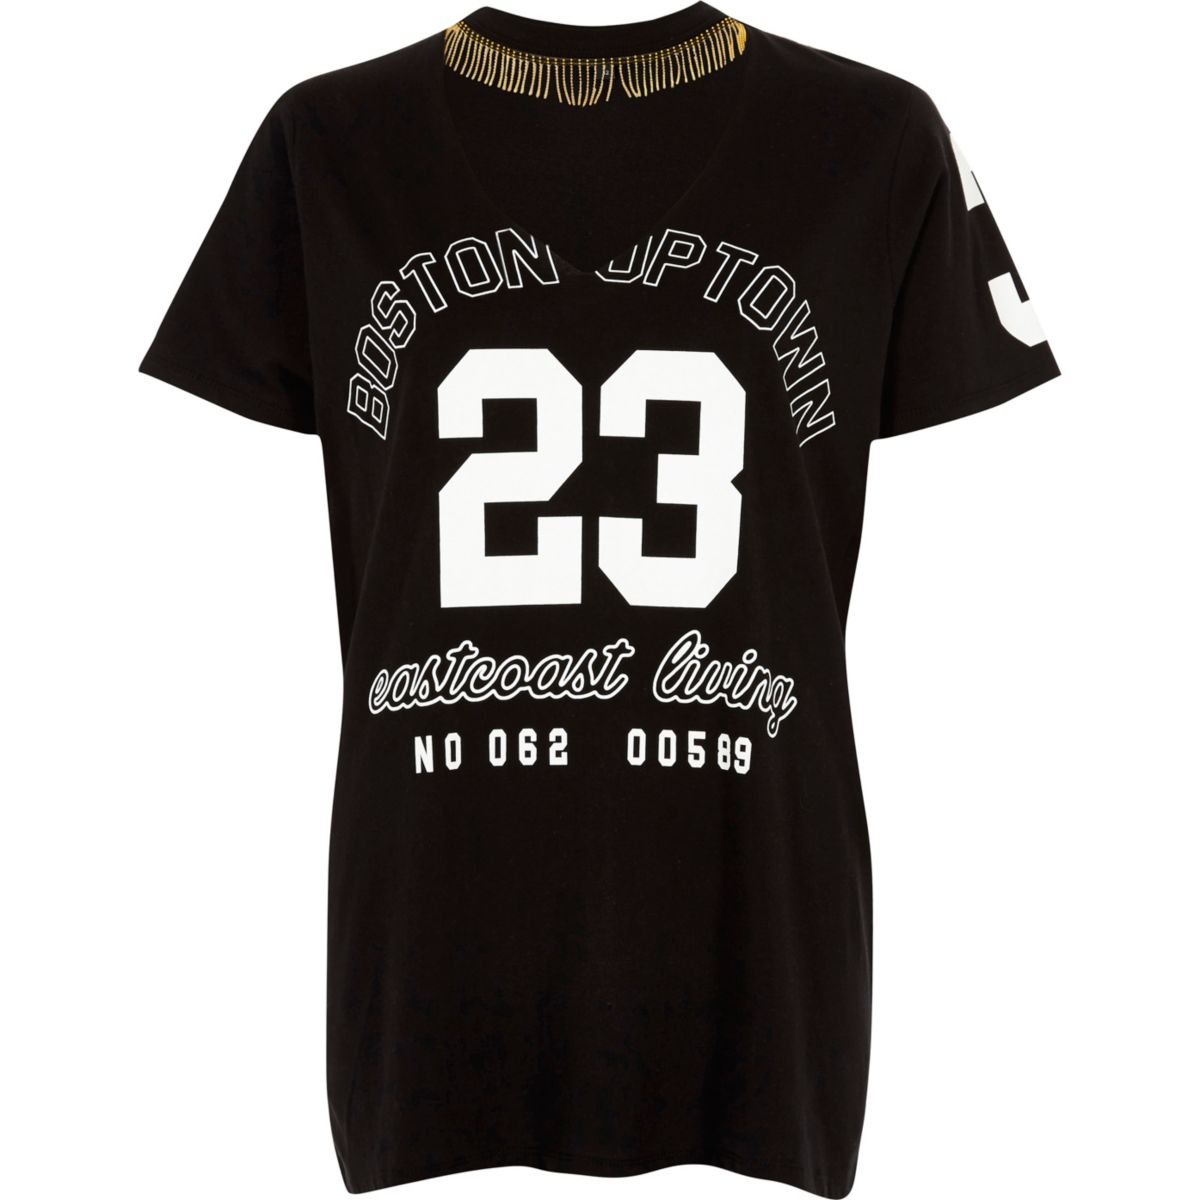 Black '23' print choker necklace T-shirt